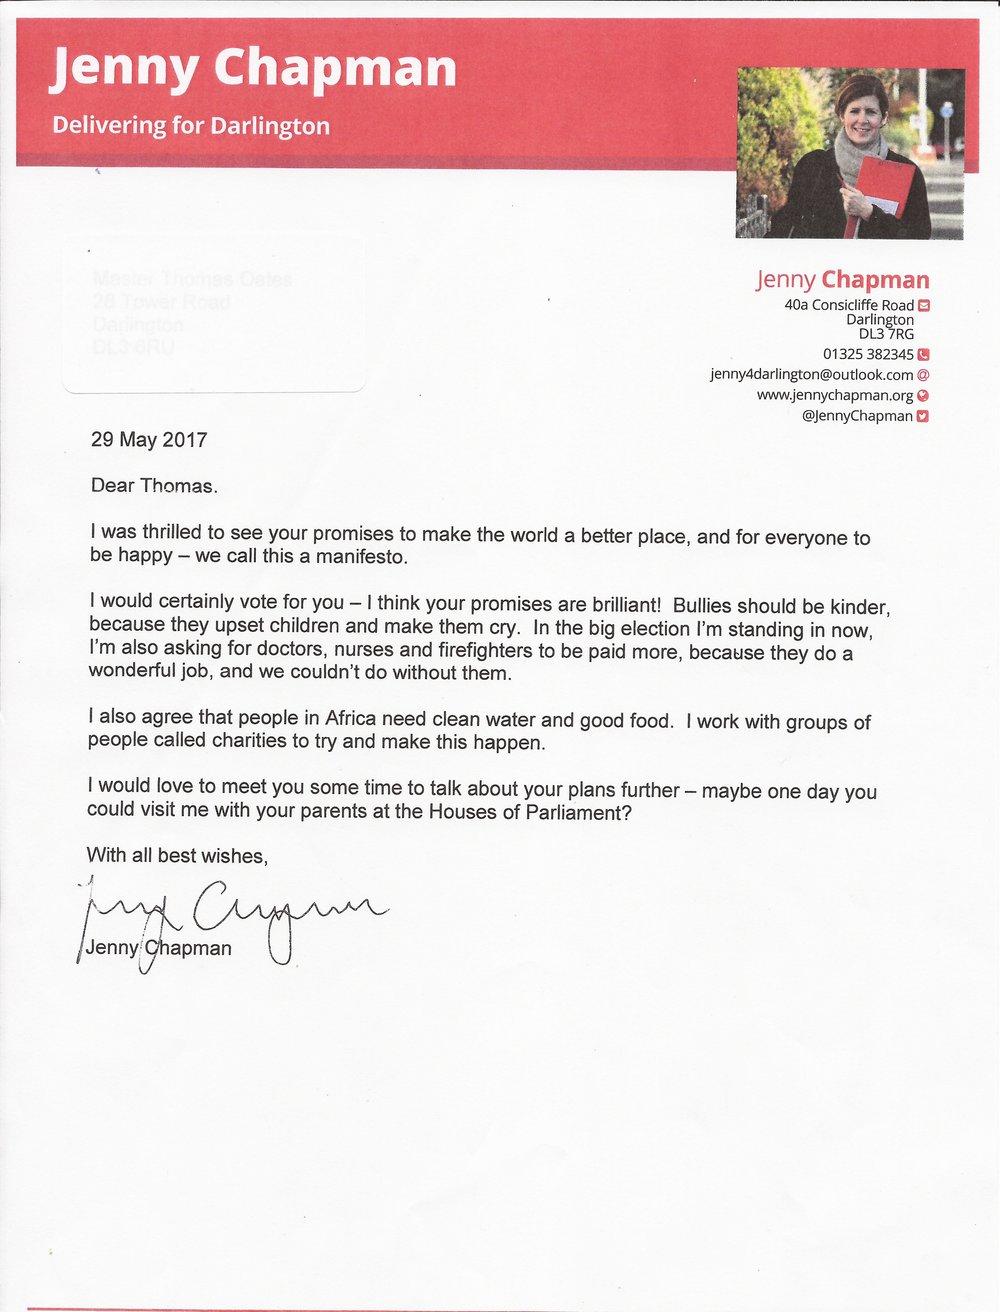 Jenny Chapman letter colour 1.jpg